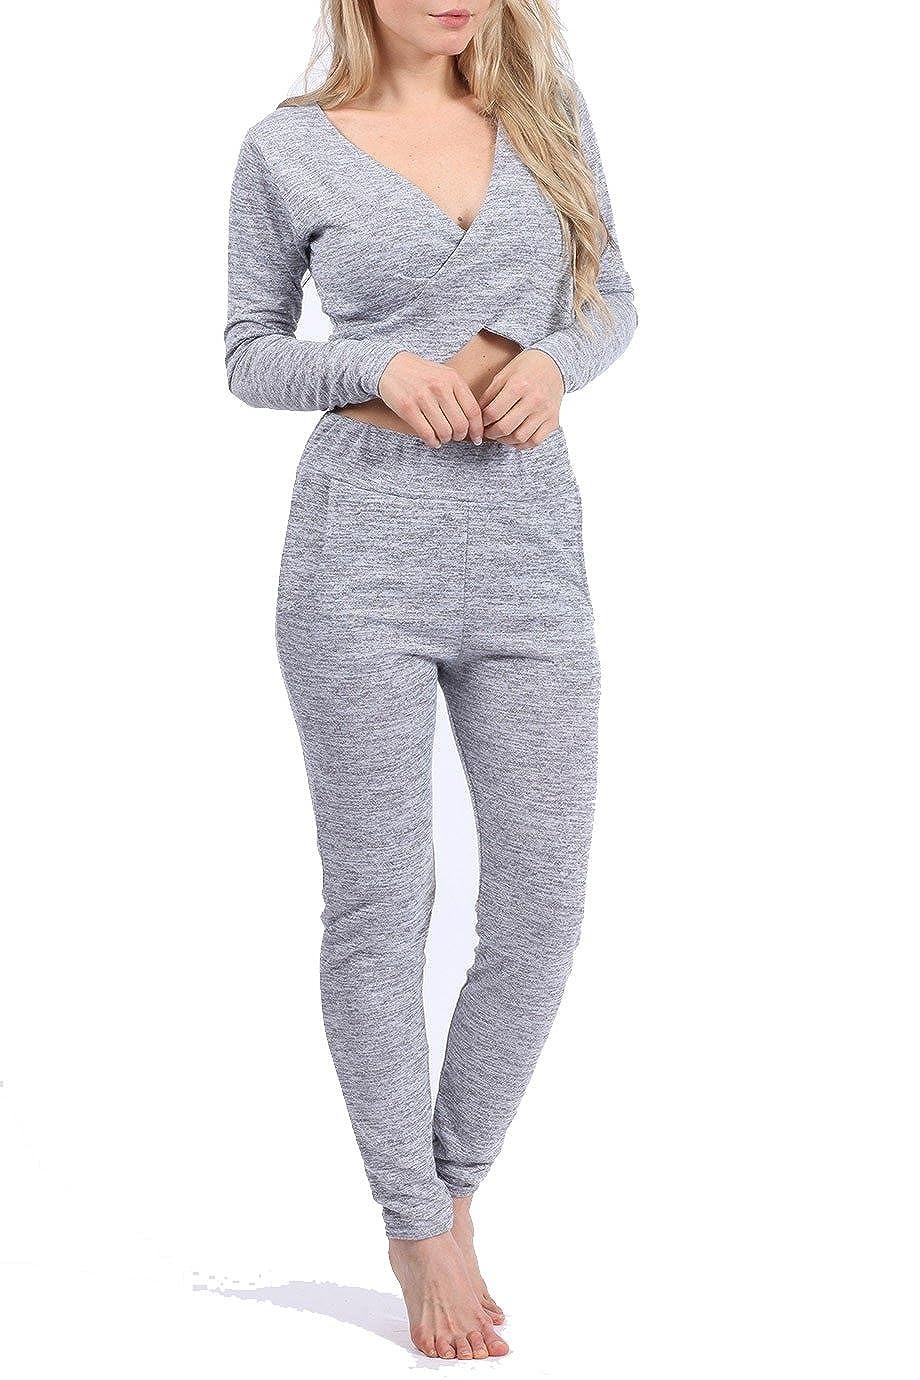 New Women Melange Crop Top and Jogger Set Grey, Nude Size UK S/M, M/L:  Amazon.co.uk: Clothing